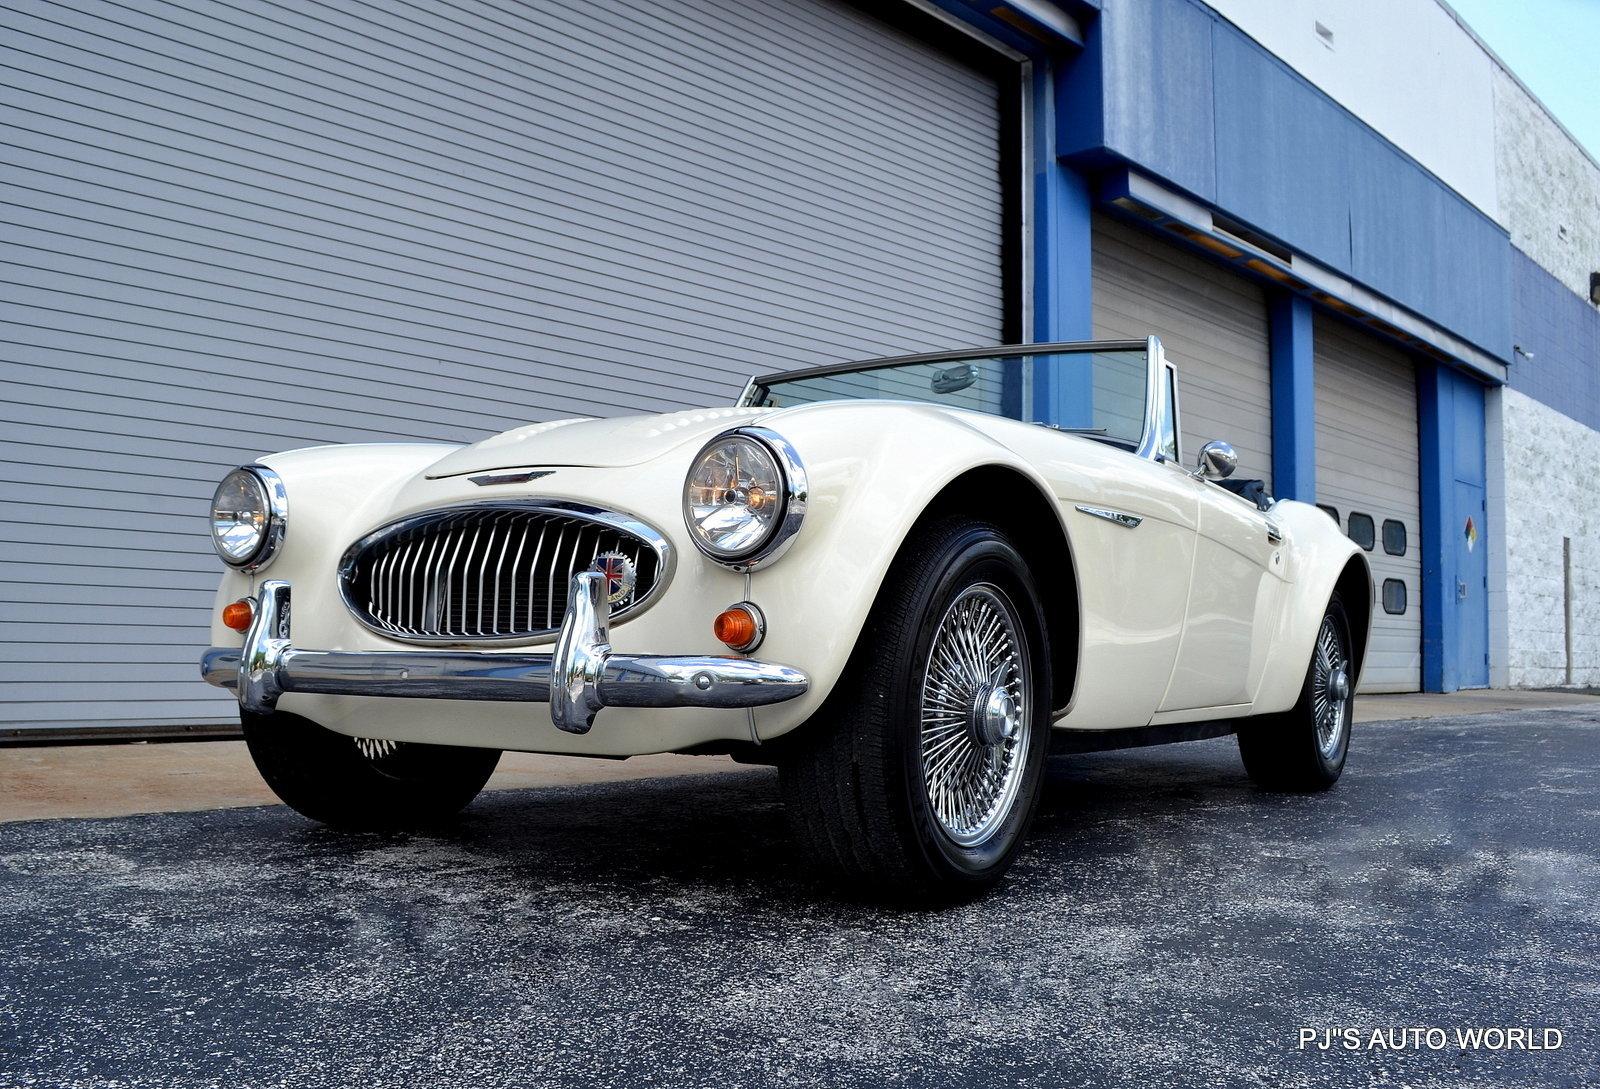 1962 Austin Healey 3000 Pj S Auto World Classic Cars For